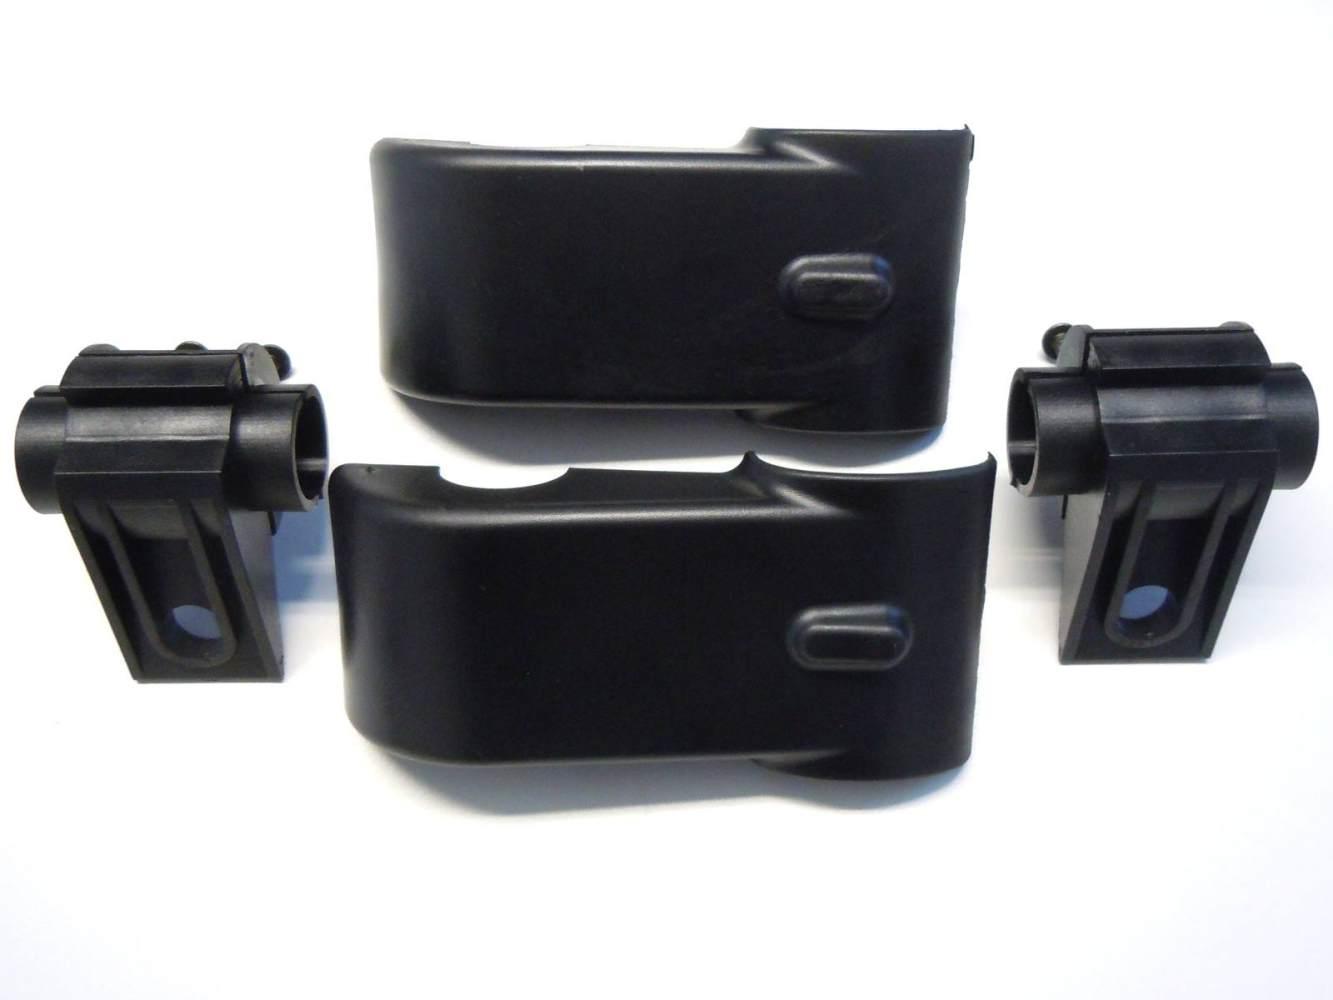 Emmaljunga Ersatzteil Federbox Reparatur-Kit (ab Modell 06) Bild 1